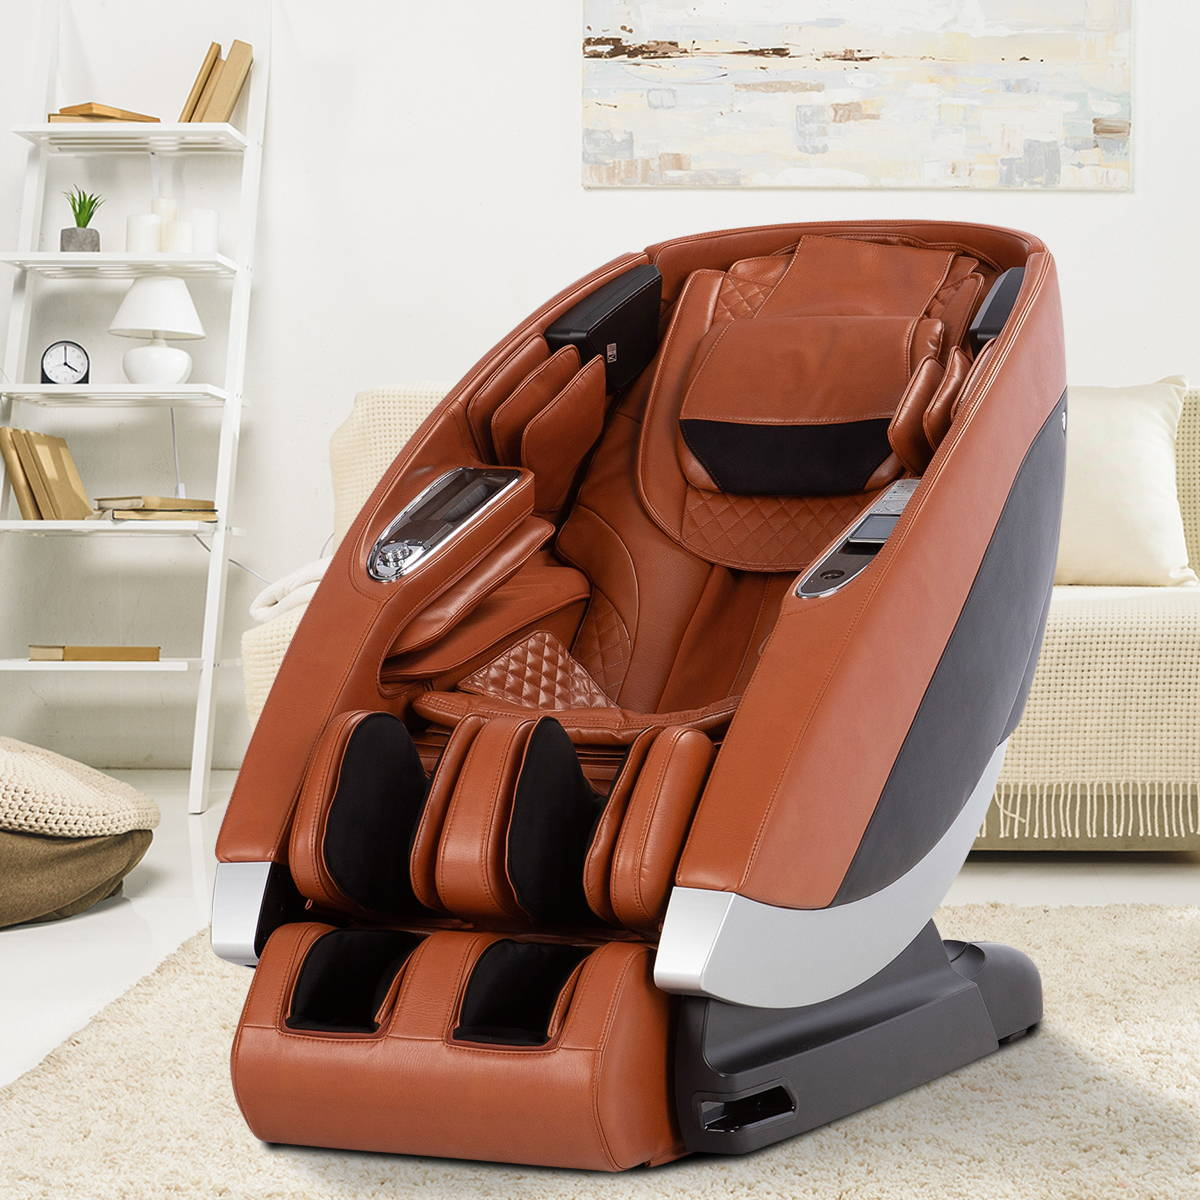 Human Touch Super Novo Massage Chair